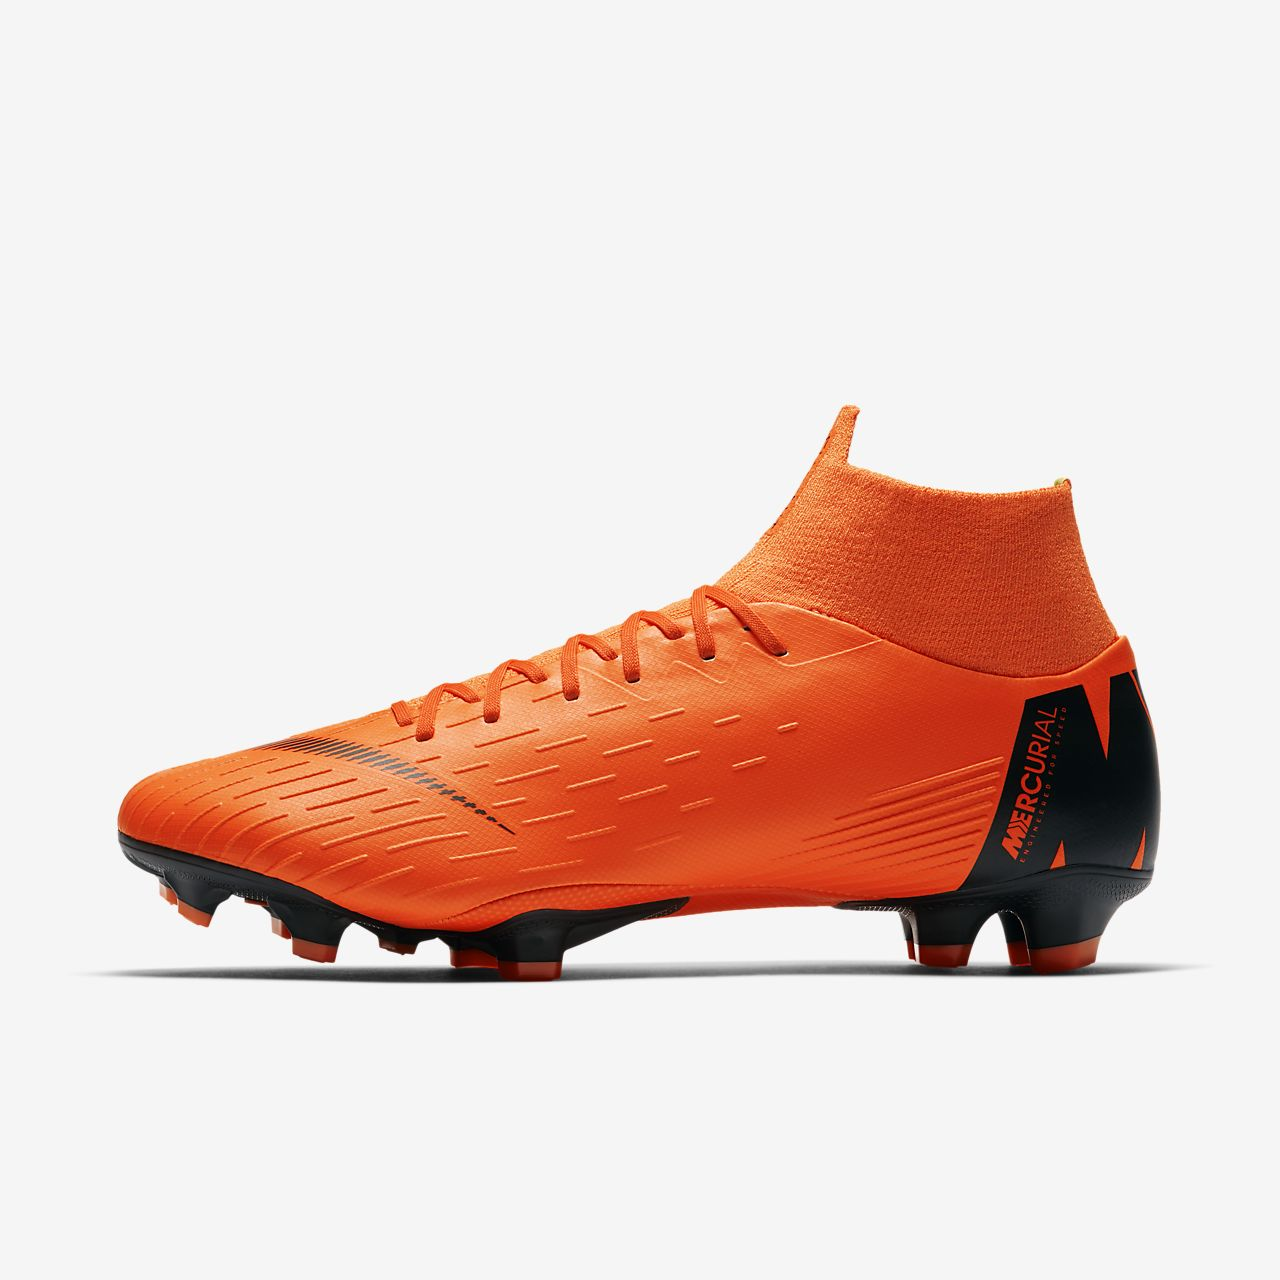 Nike Mercurial Superfly VI Academy MG, Chaussures de Football Homme, Noir (Black/Total Orange-W 081), 40.5 EU